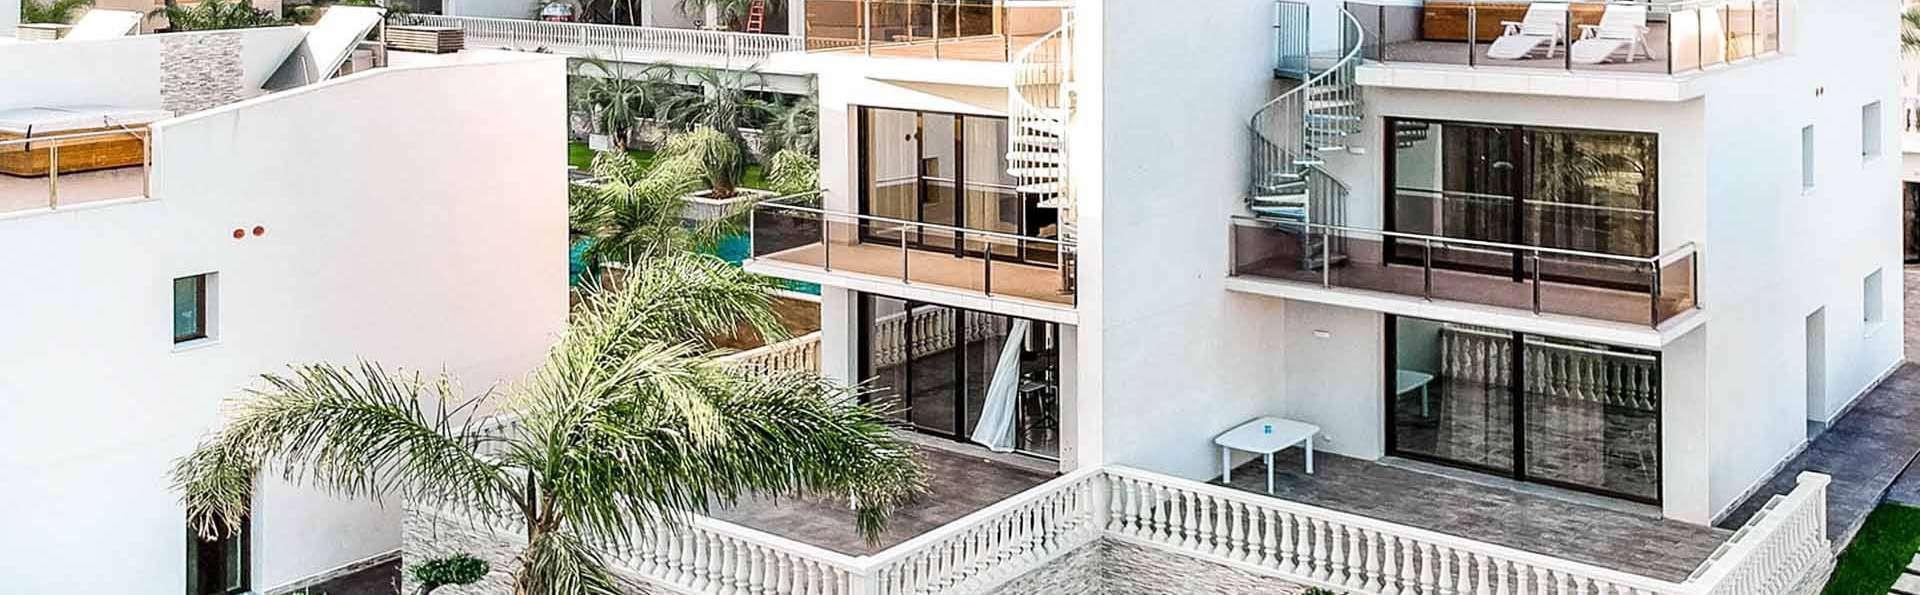 Calma Holiday Villas - EDIT_calma_05.jpg